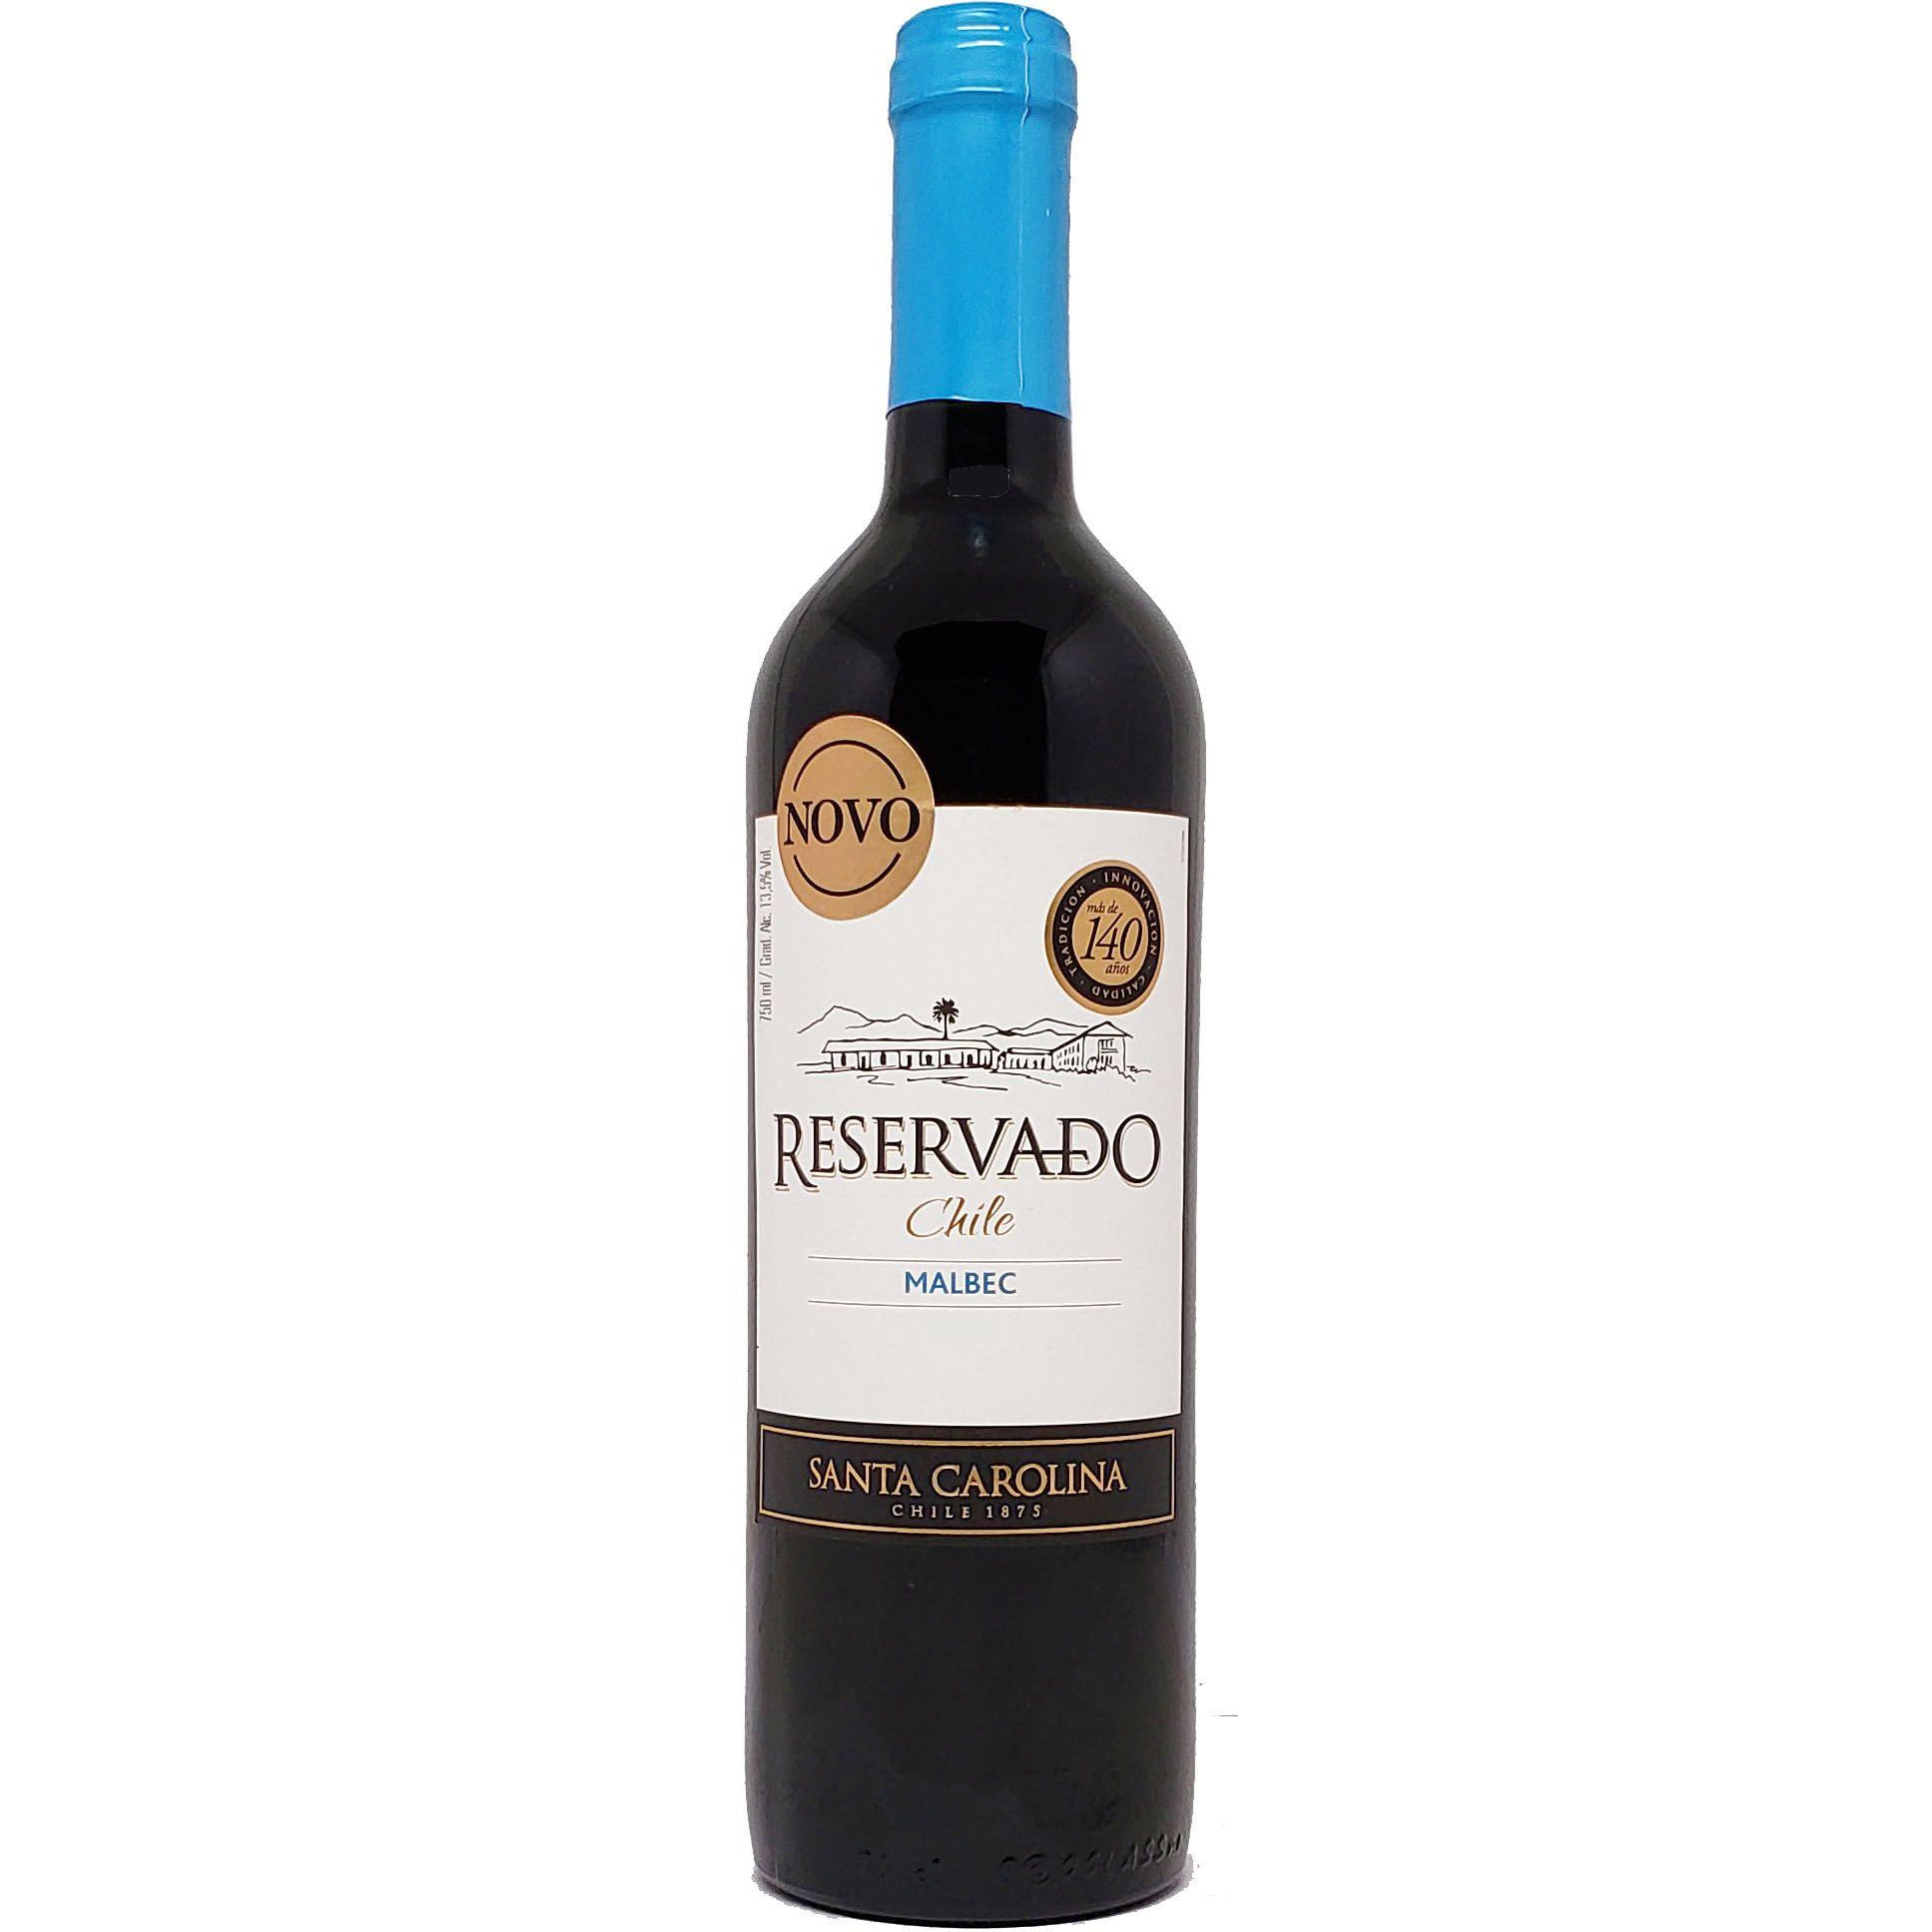 Vinho Santa Carolina Reservado Malbec Chile - 750ml -